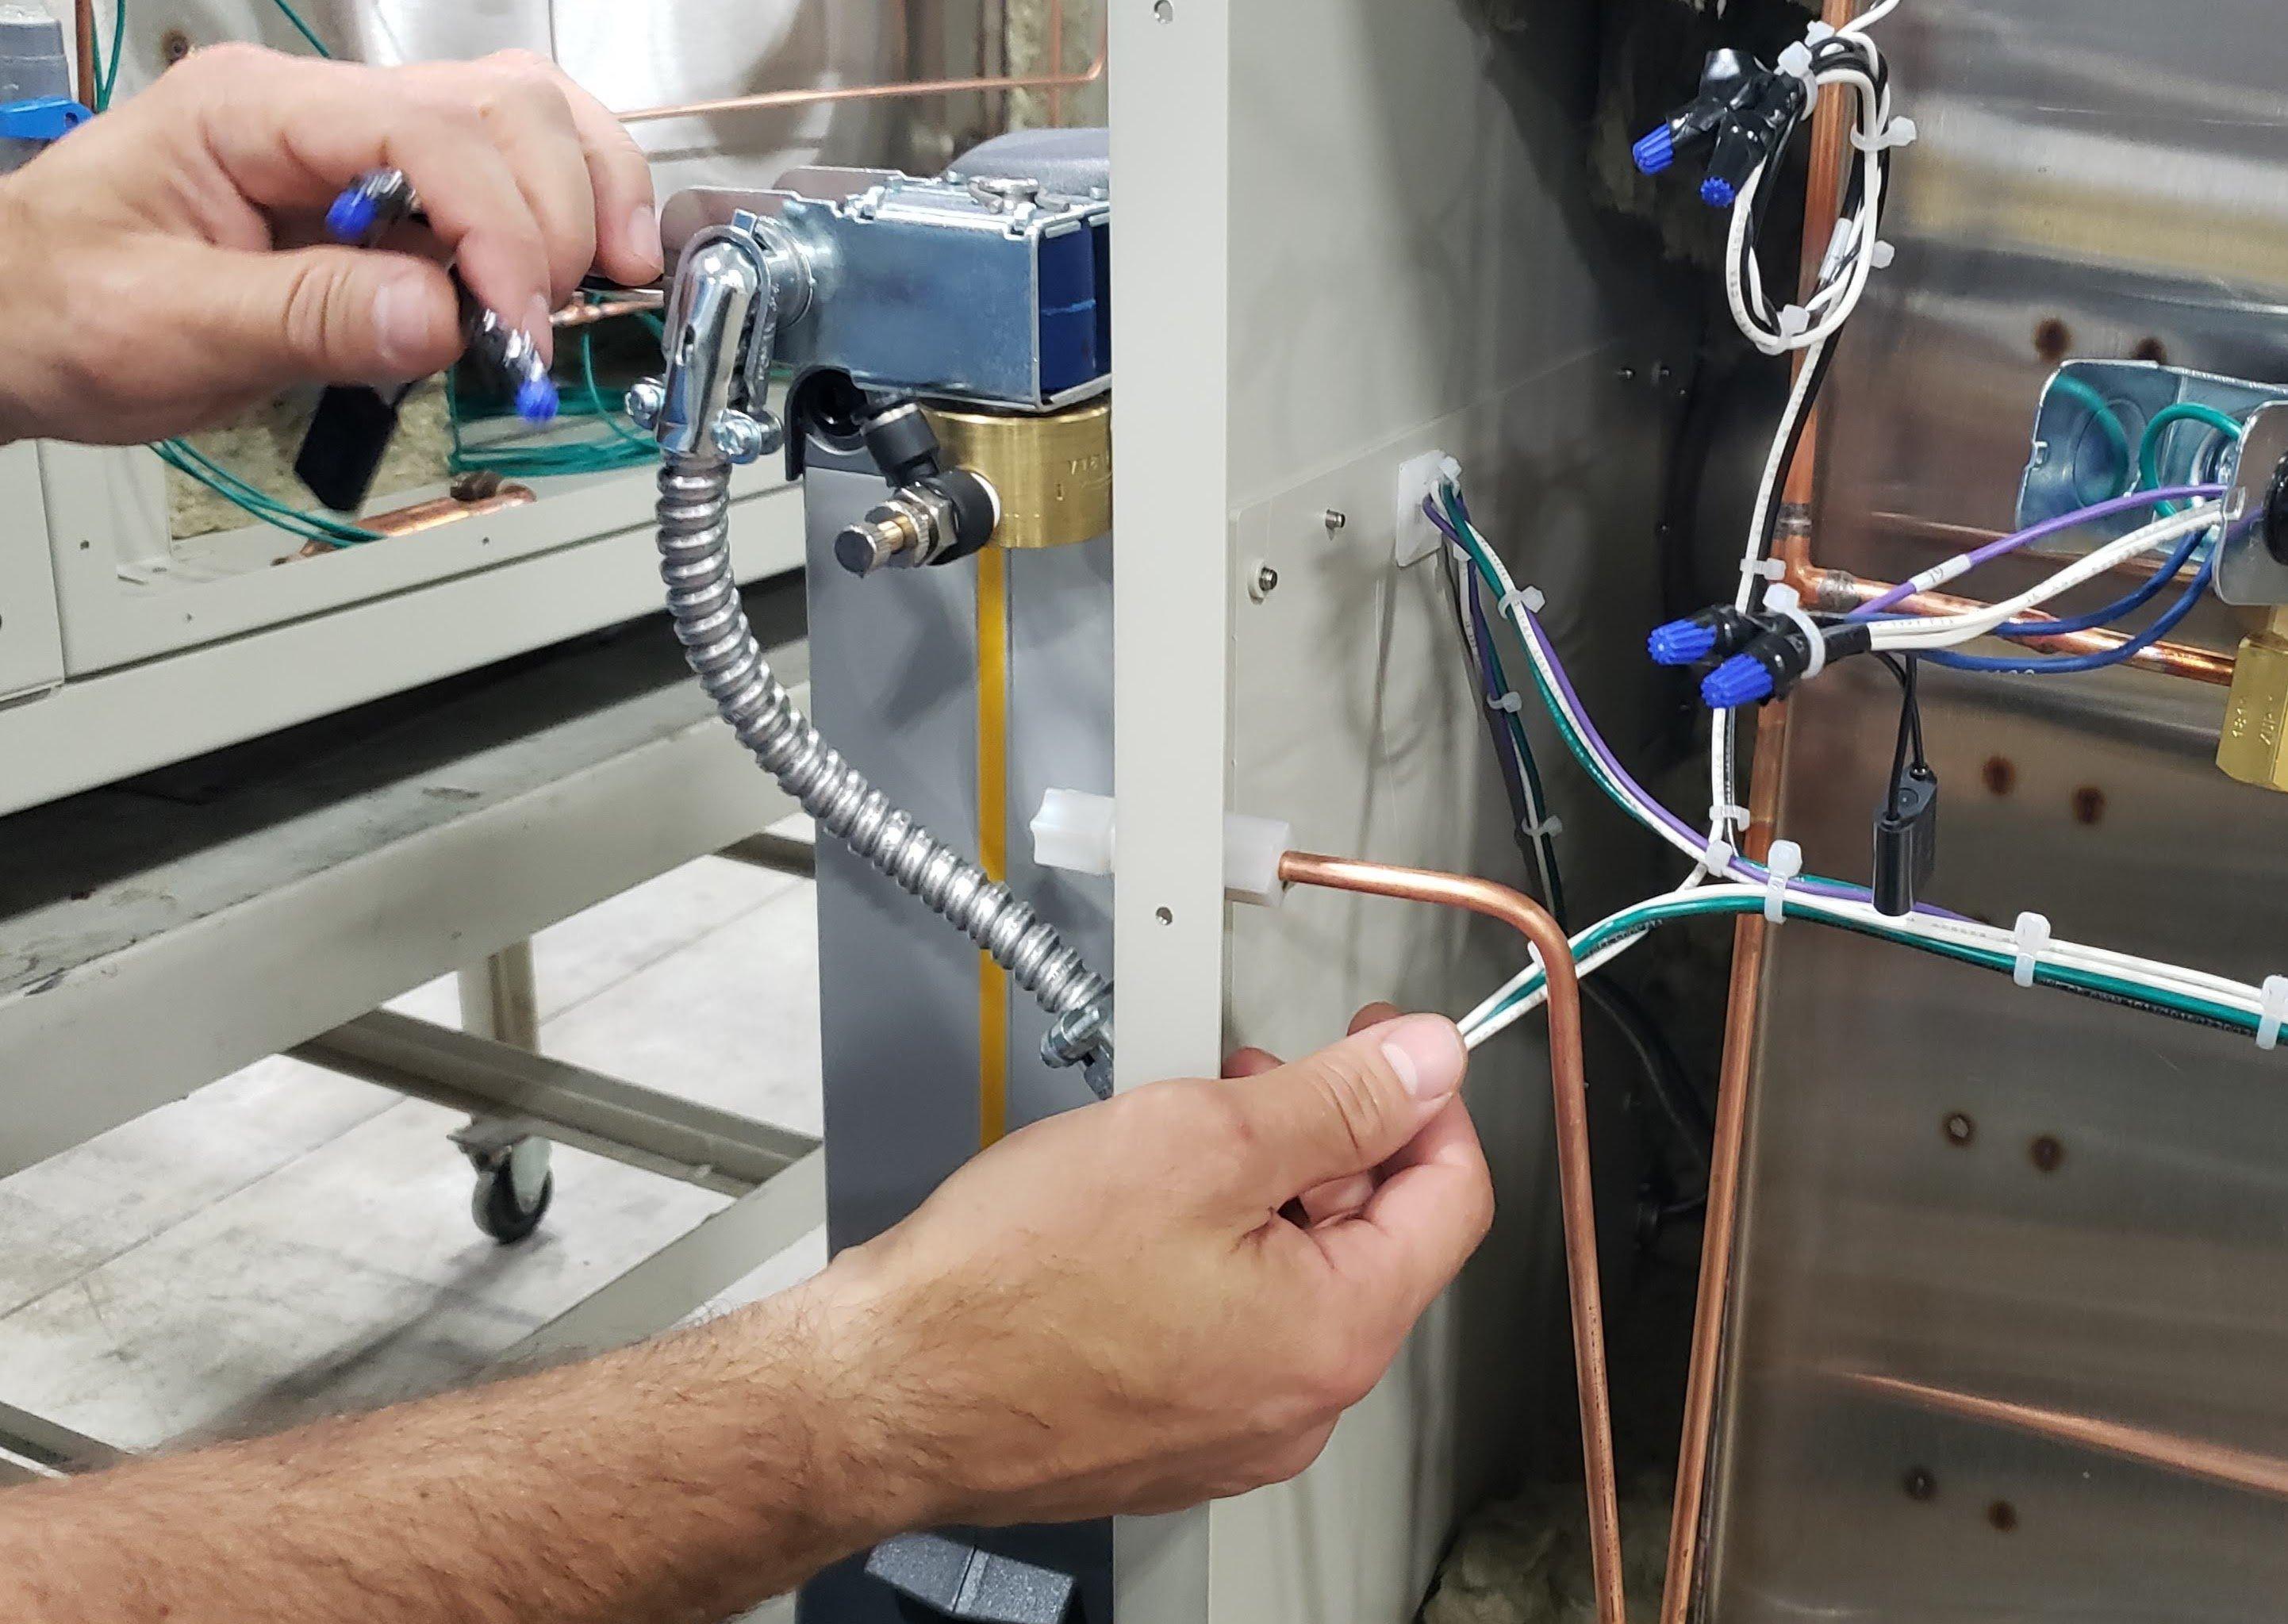 dehumidifier dry air purge by associated environmental systems